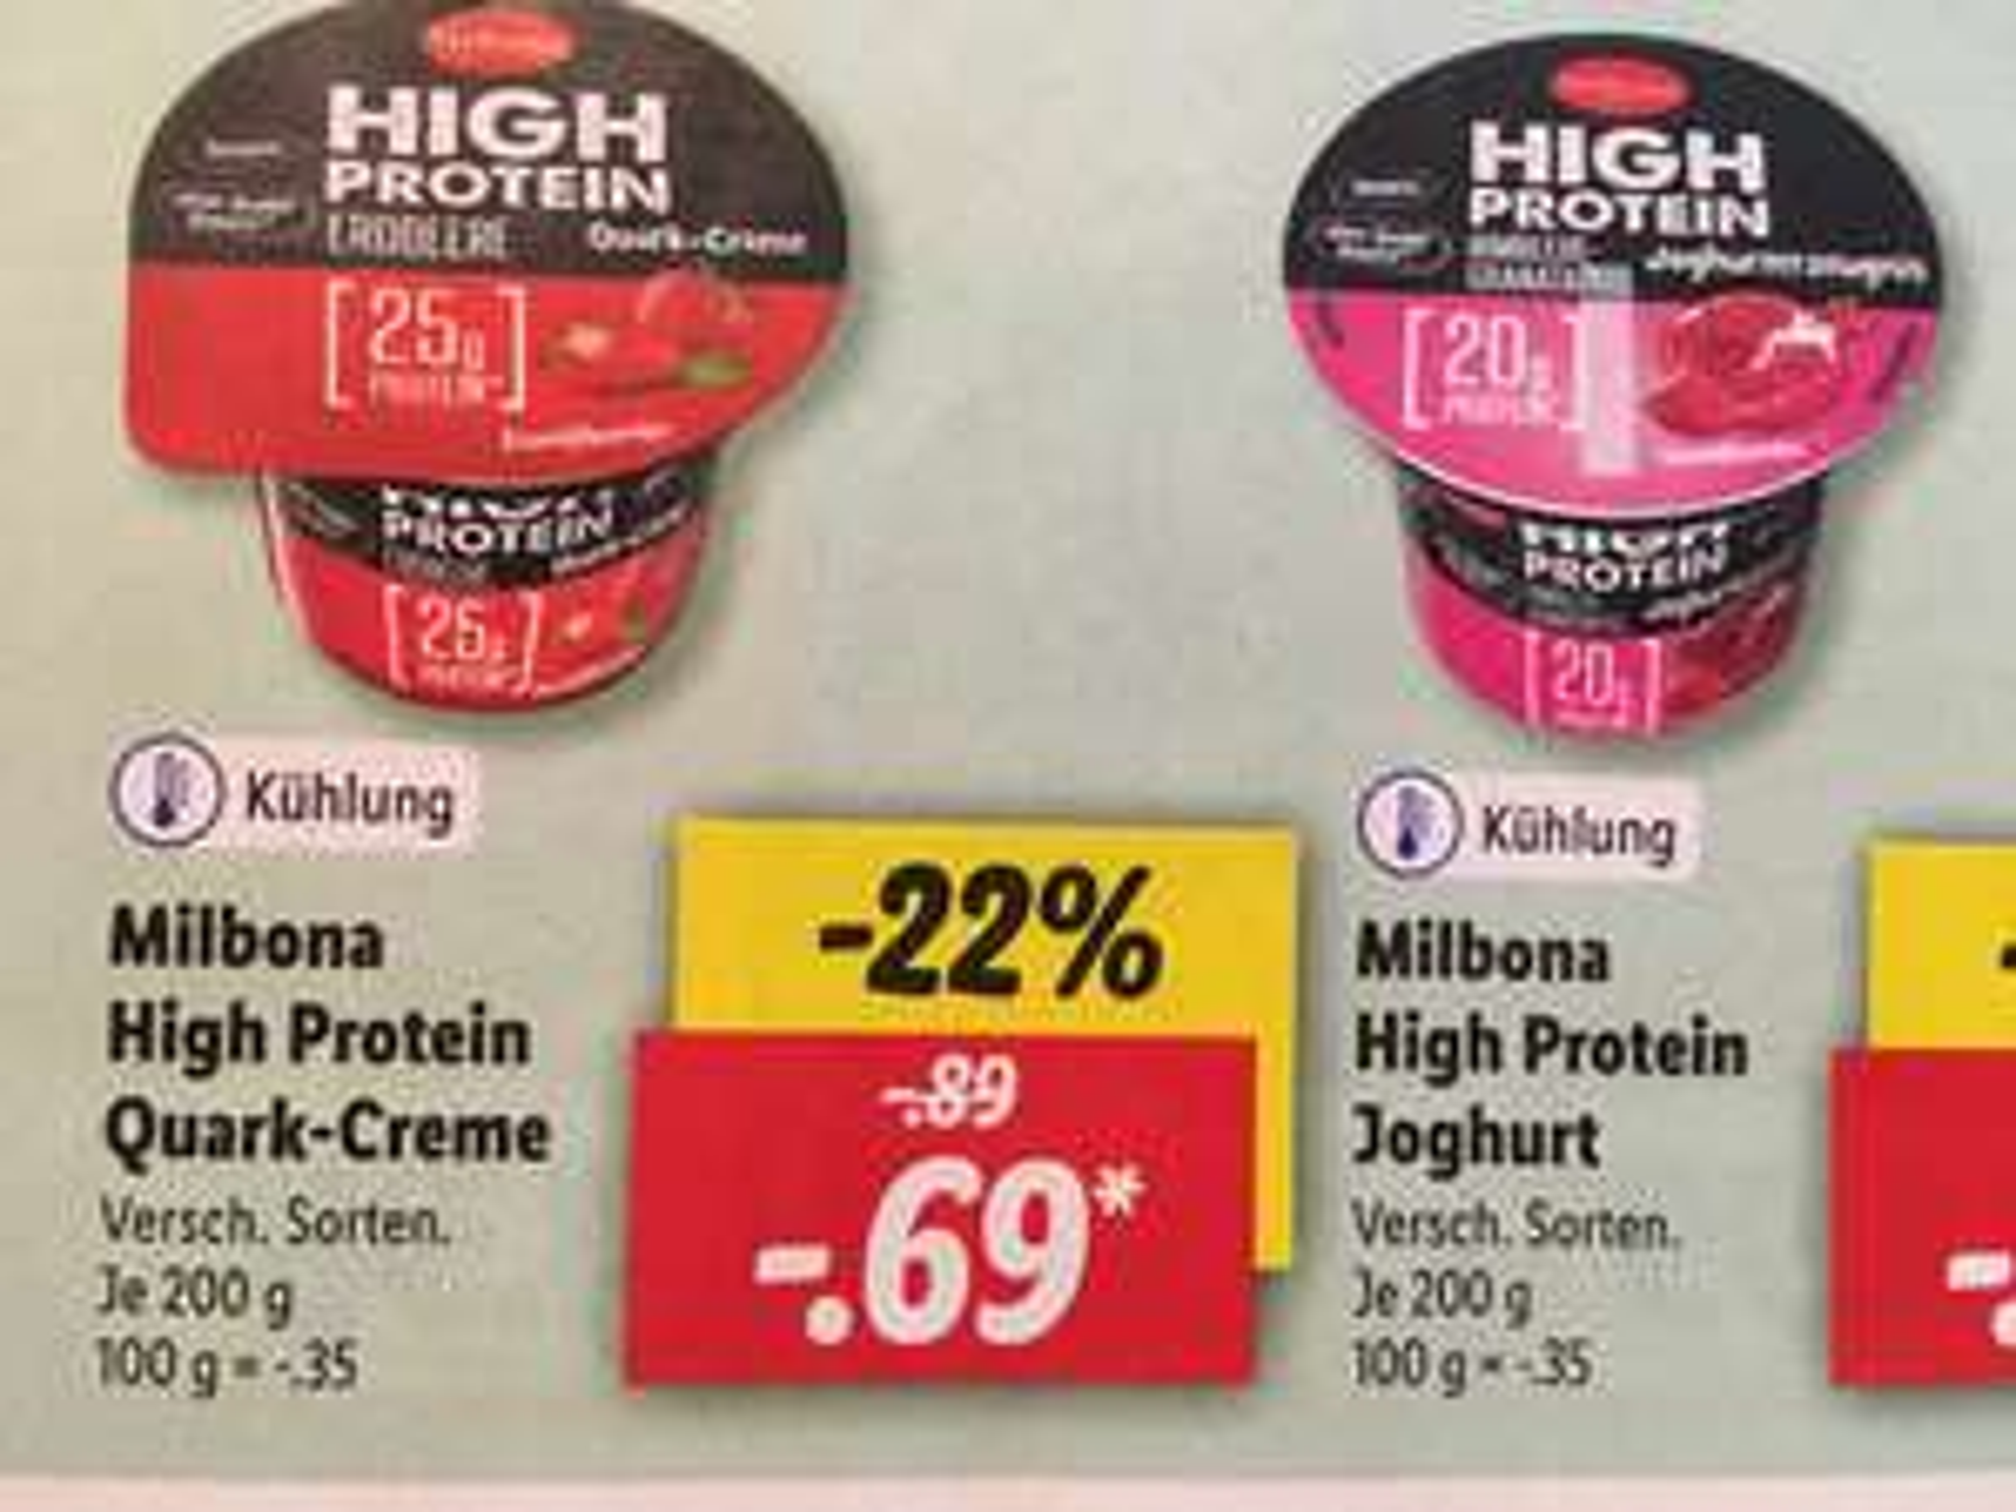 Lidl High Protein Pudding / Quark